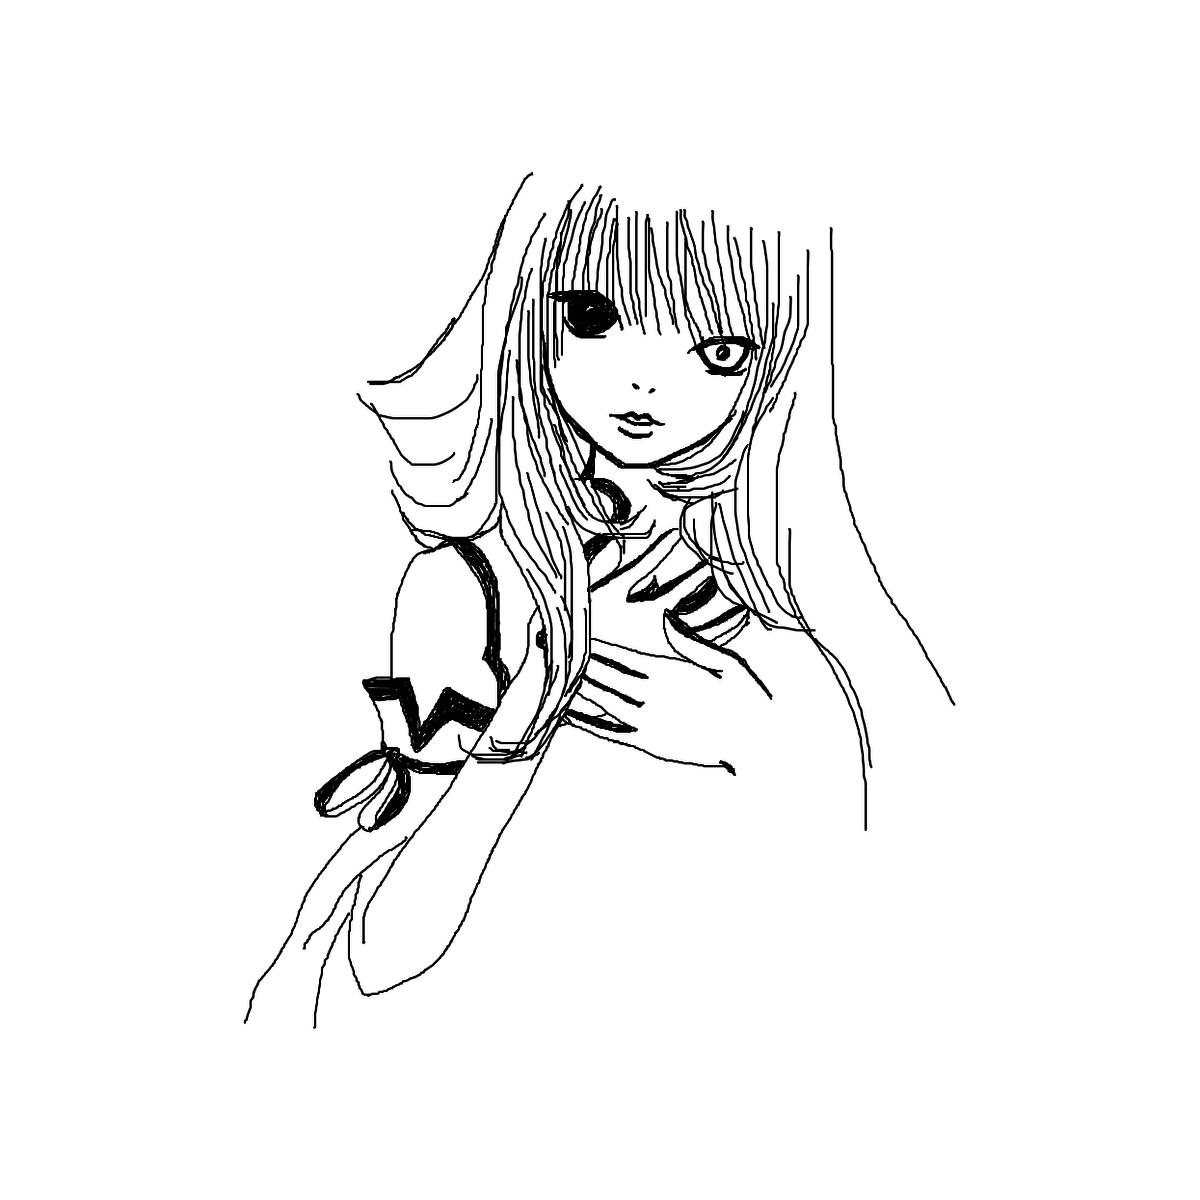 BAAAM drawing#23417 lat:45.7347602844238300lng: 4.9029006958007810